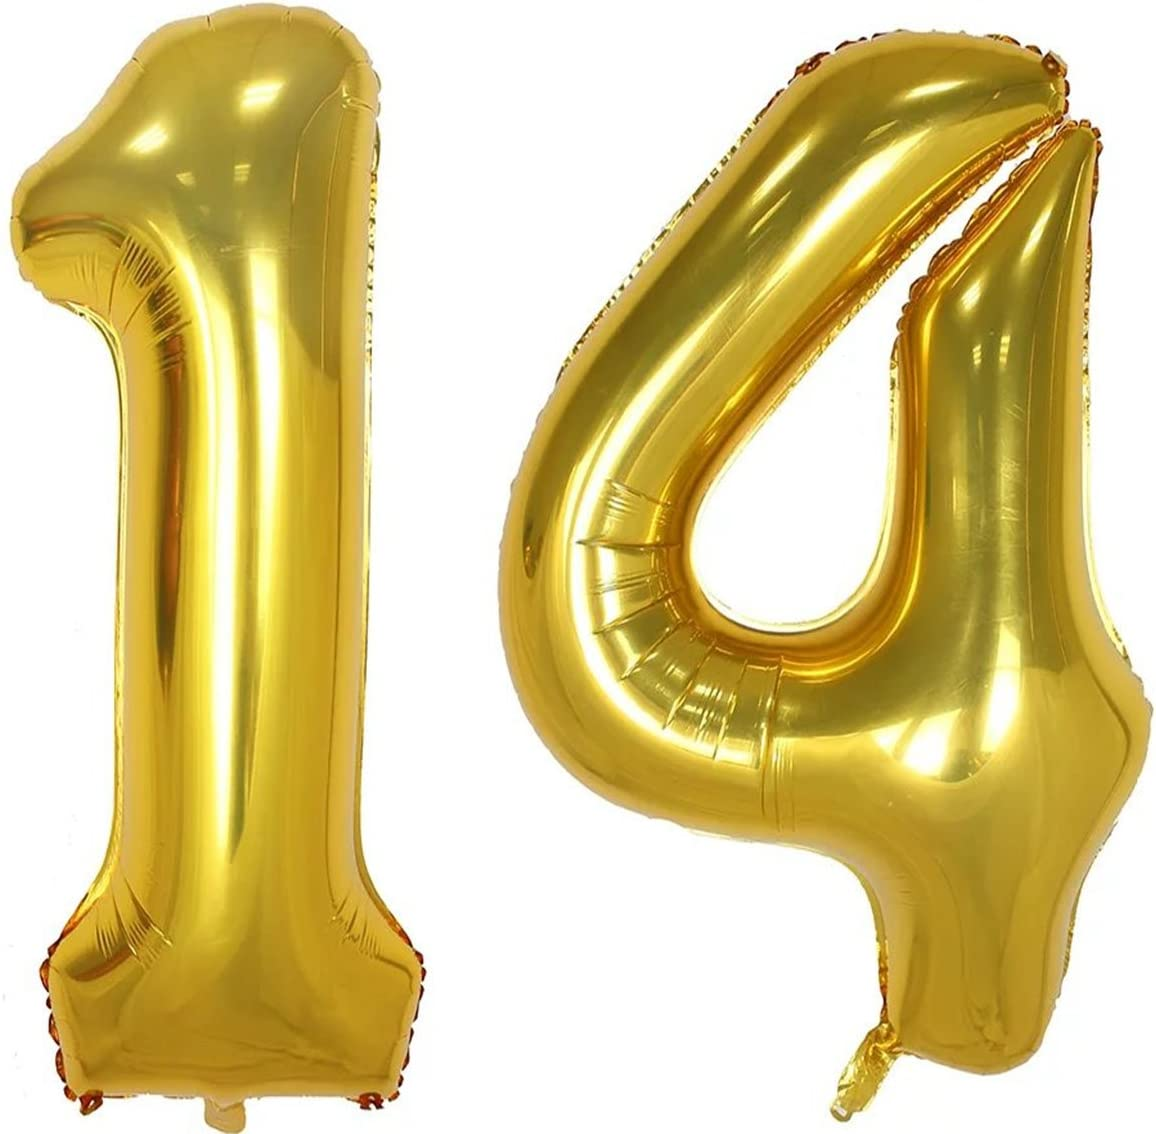 Juland Rose Gold Number Balloons XXL Giant Foil Birthday Balloon Large Foil Mylar Balloons 40 Inch Giant Jumbo Number Balloons for Birthday Party Decorations 15